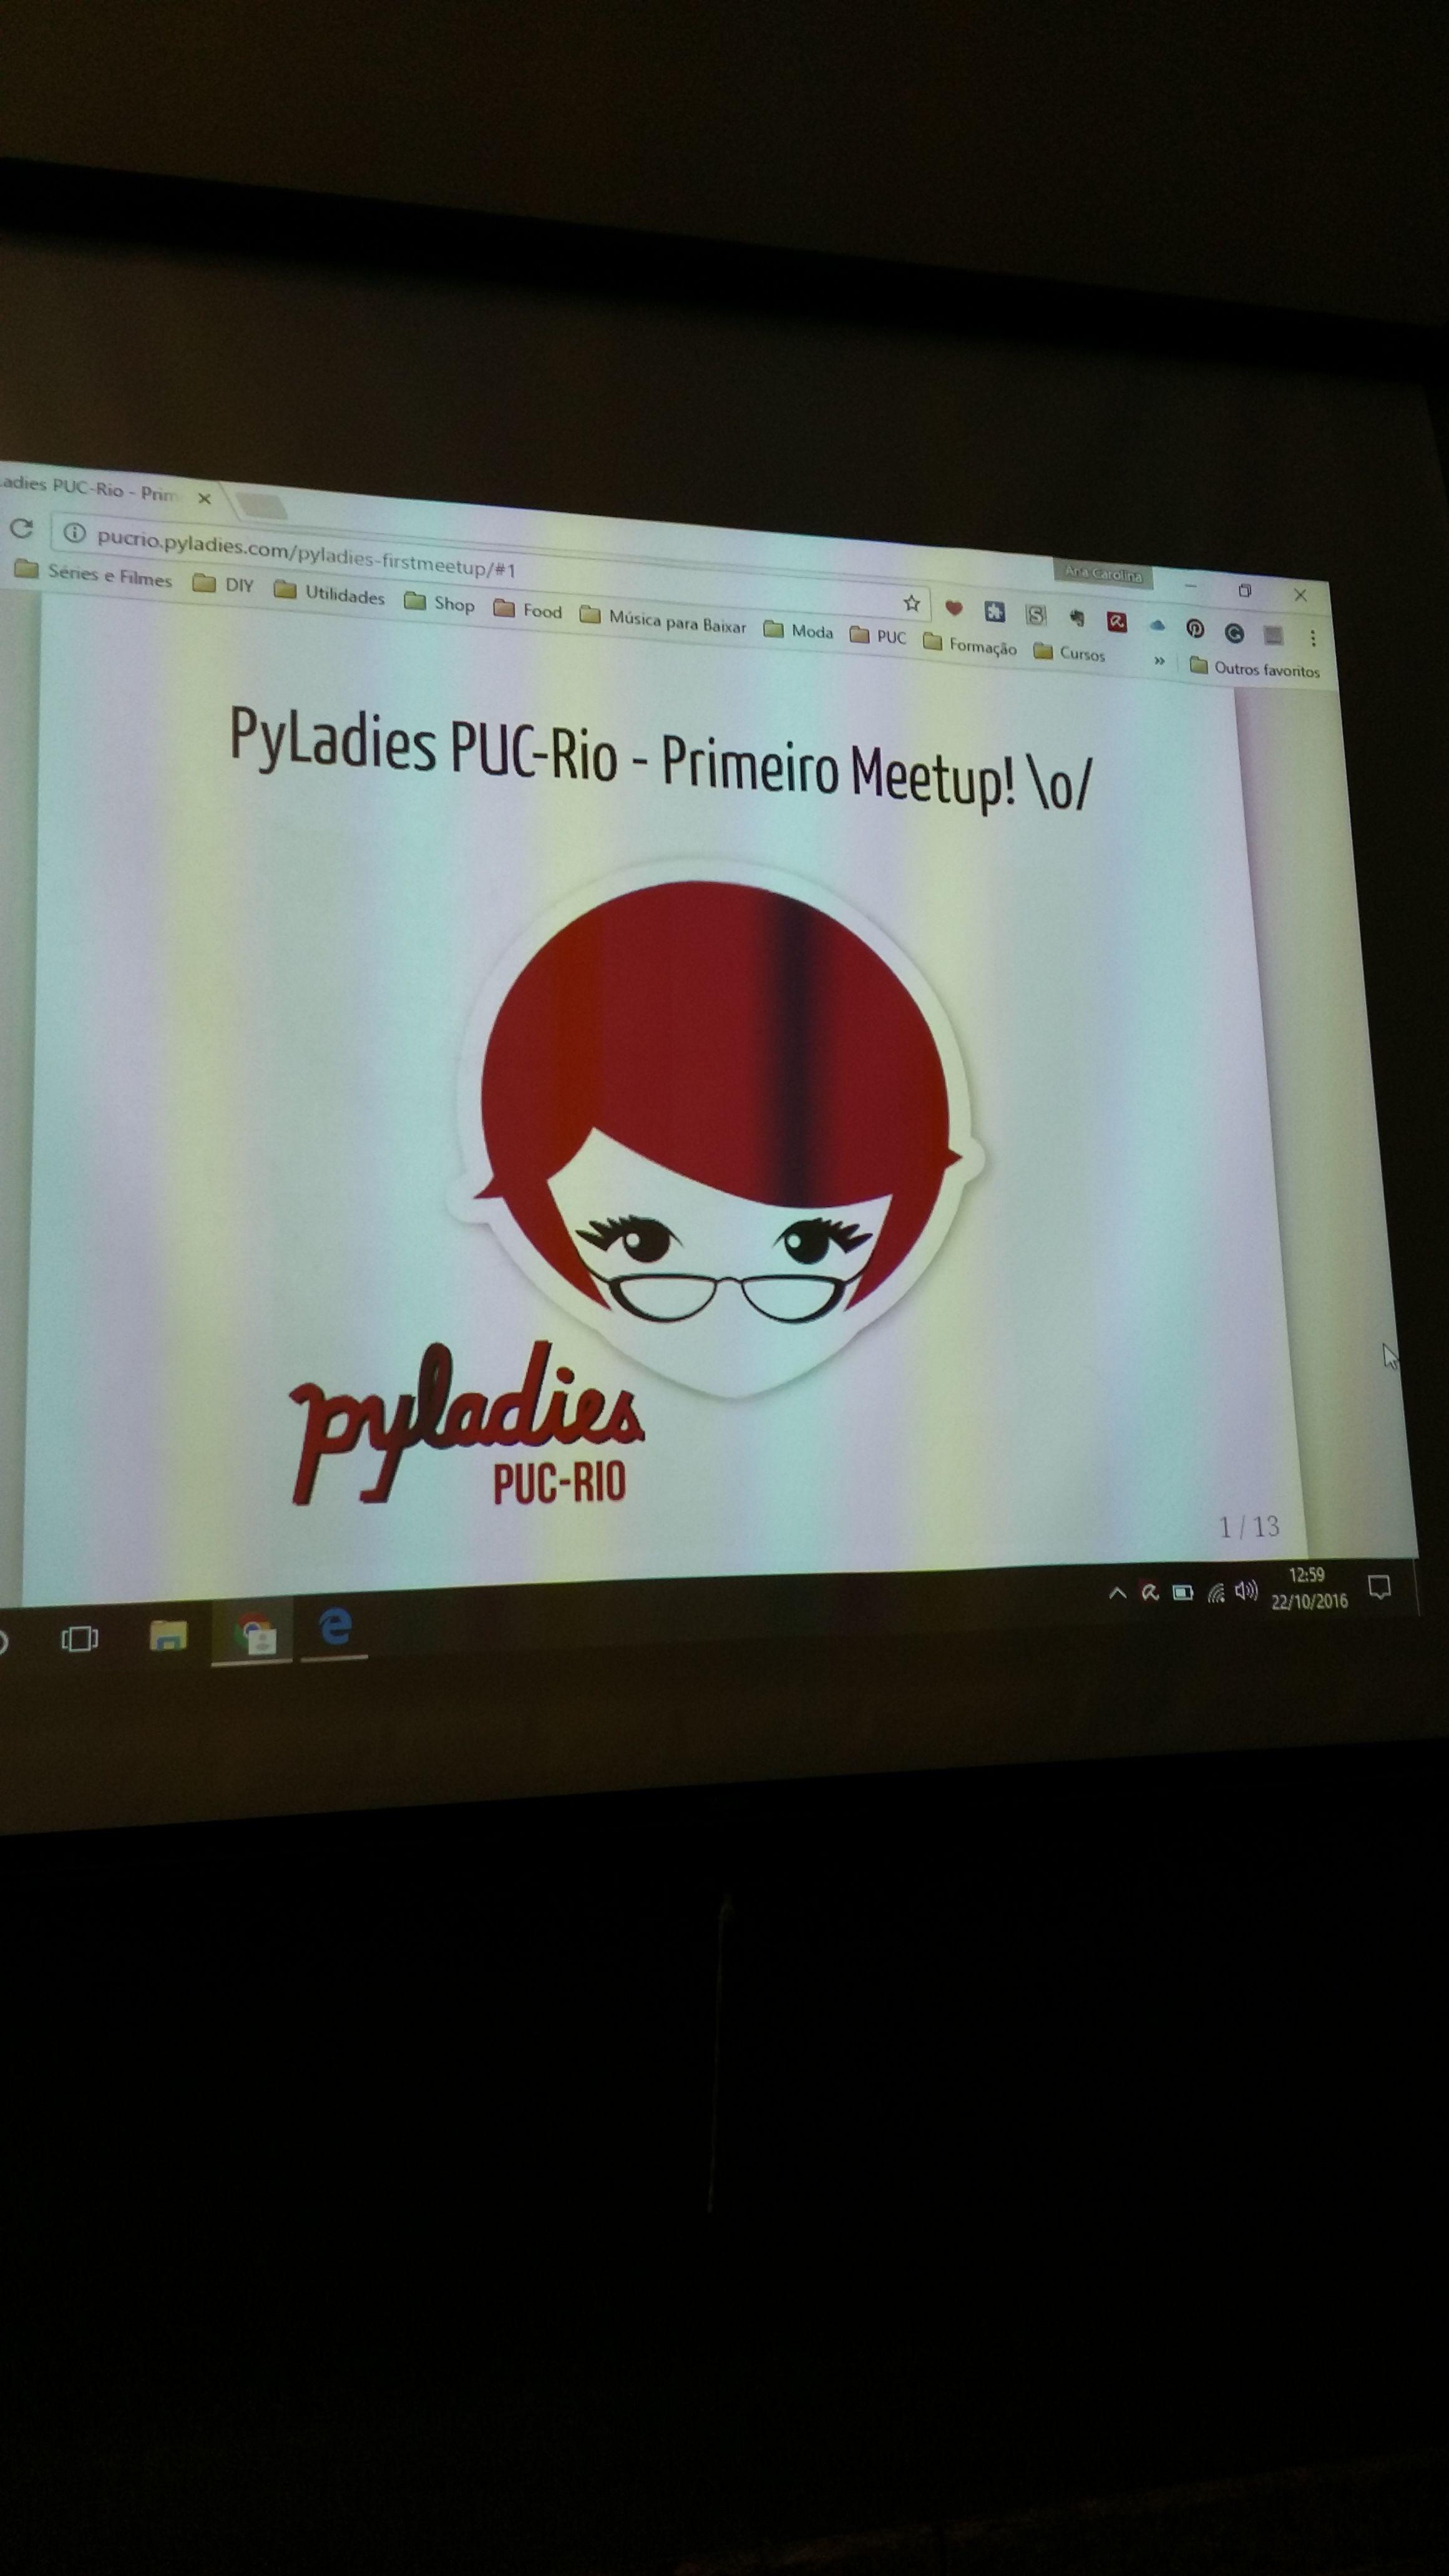 PyLadies PUC-Rio